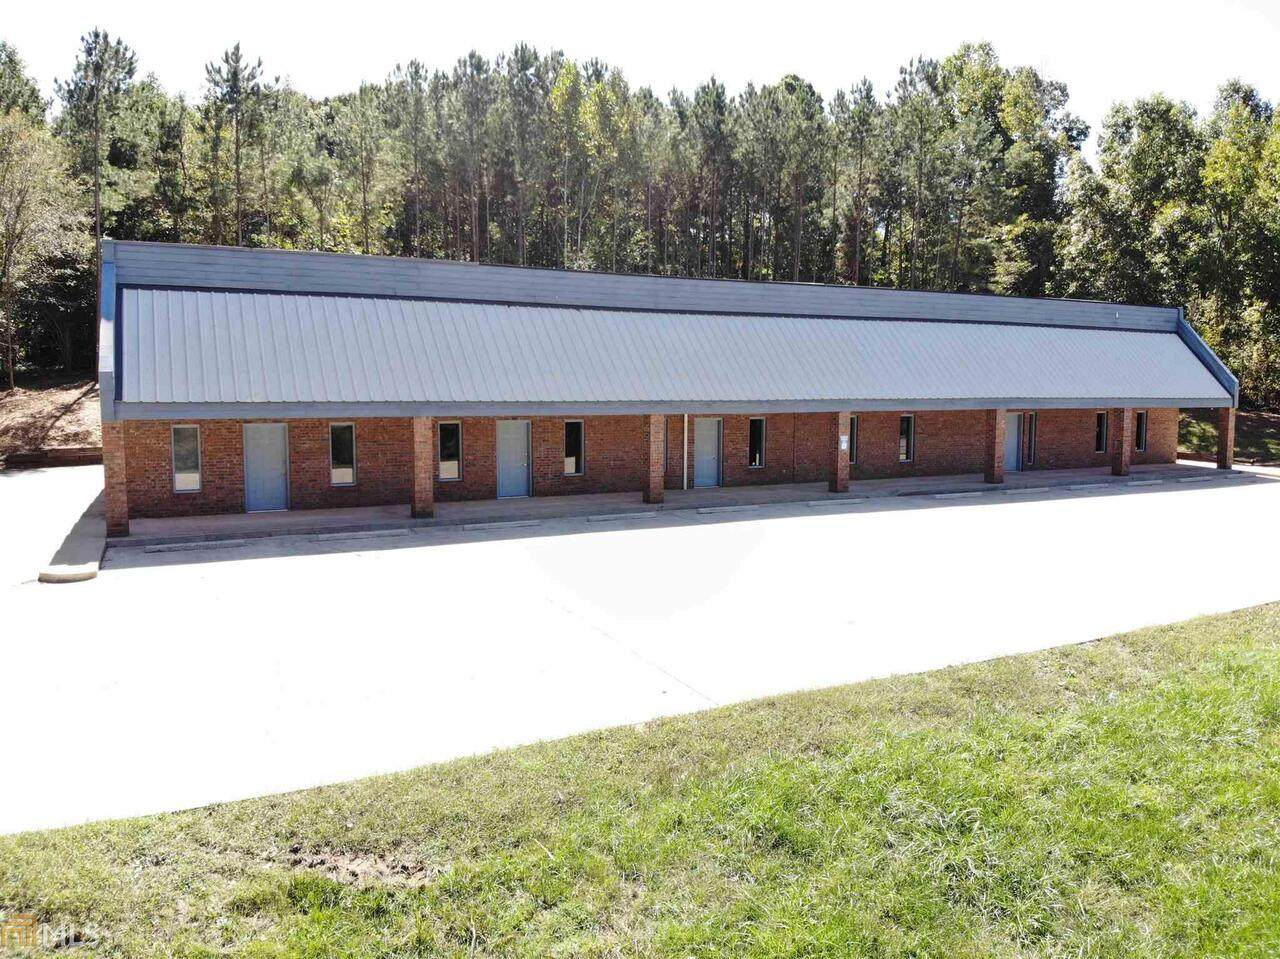 232 234 & 236 Industrial Park Drive - Photo 1